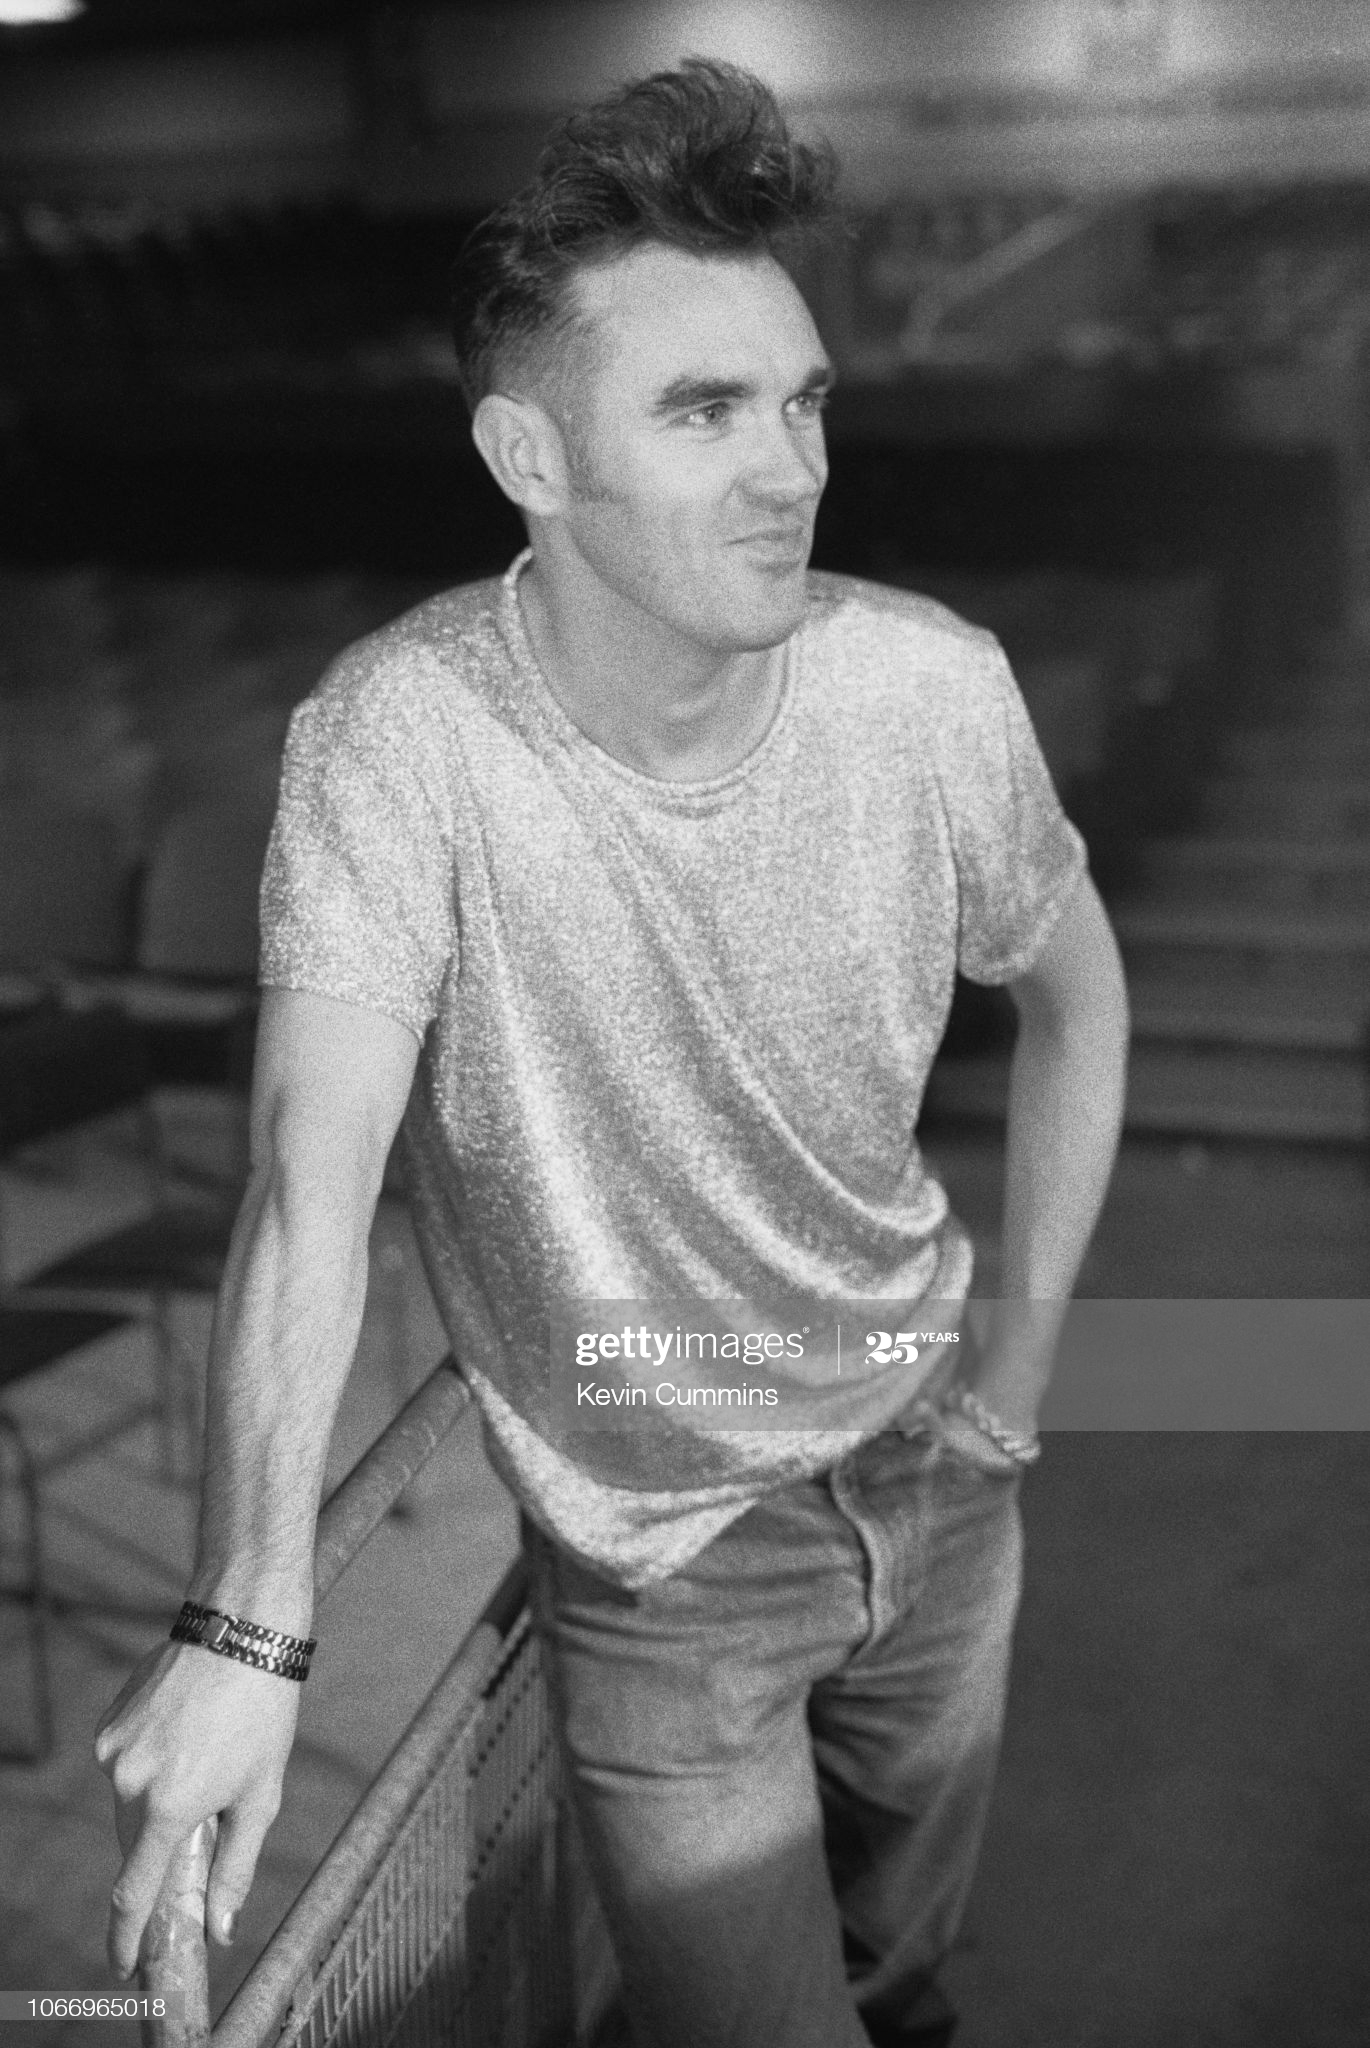 Morrissey Dublin 27th April 1991 Kevin Cummins.jpg